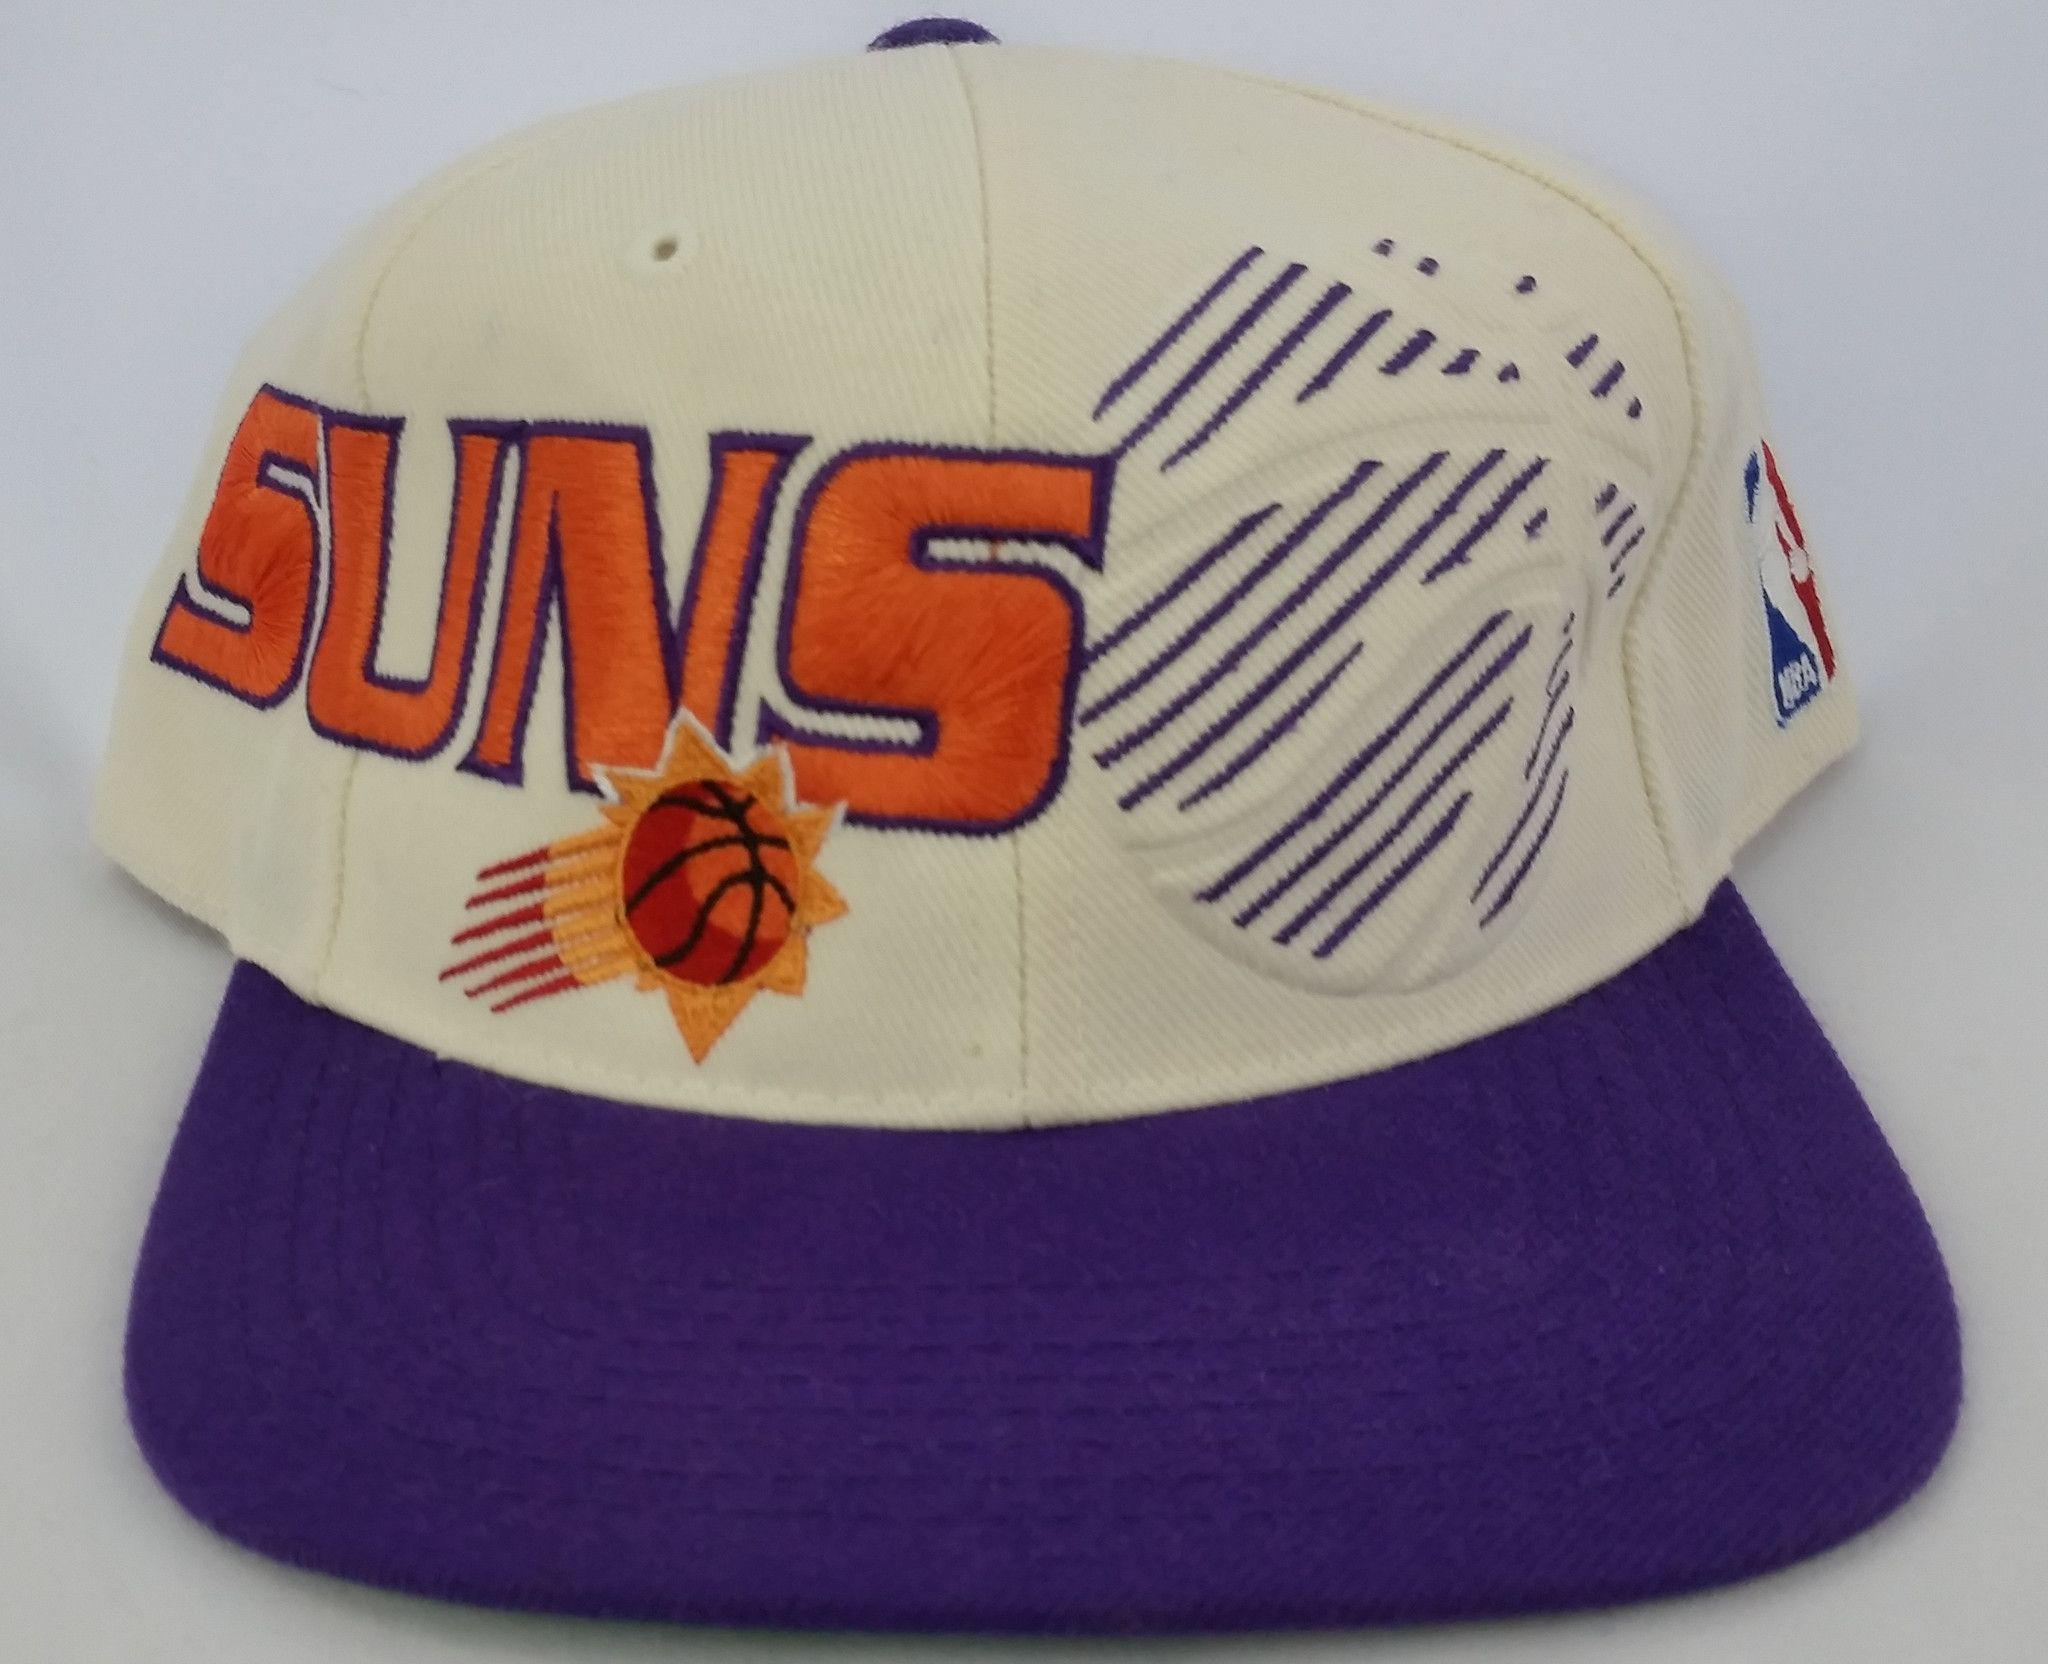 33799c395 Phoenix Suns Hat Sports Specialties Vintage NBA Basketball Cap ...